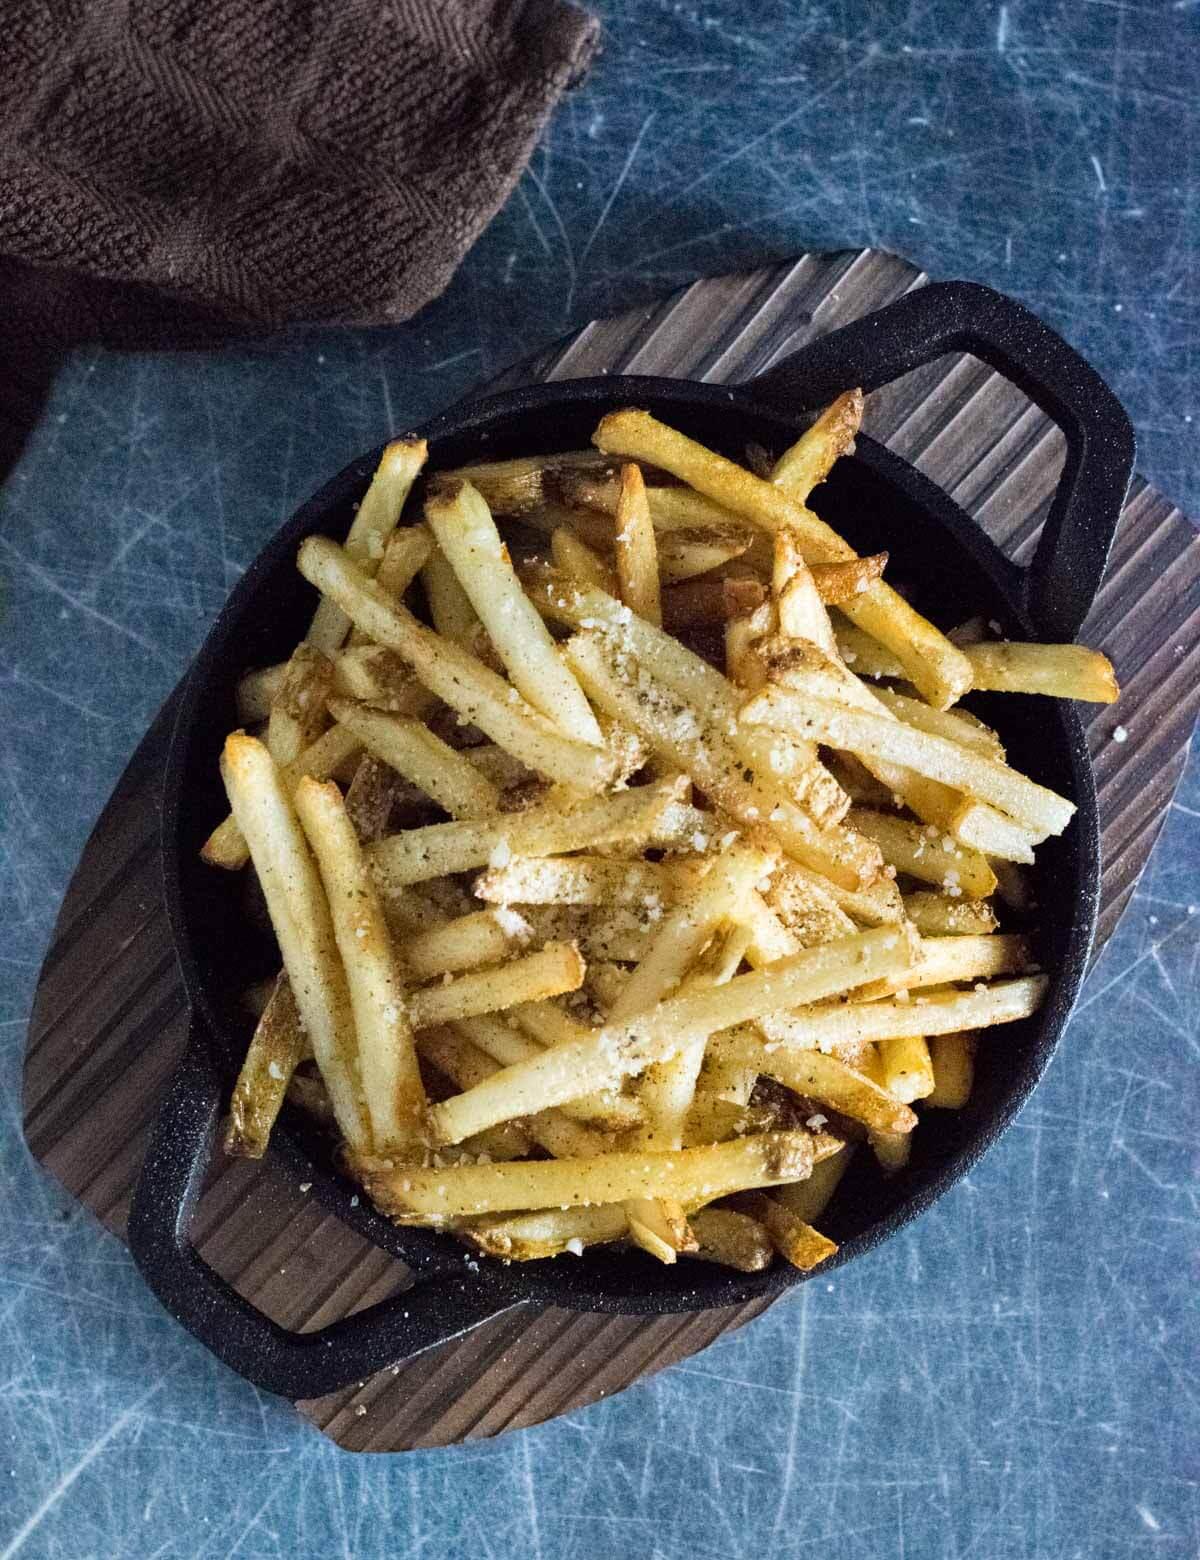 Parmesan truffle fries in black serving bowl.